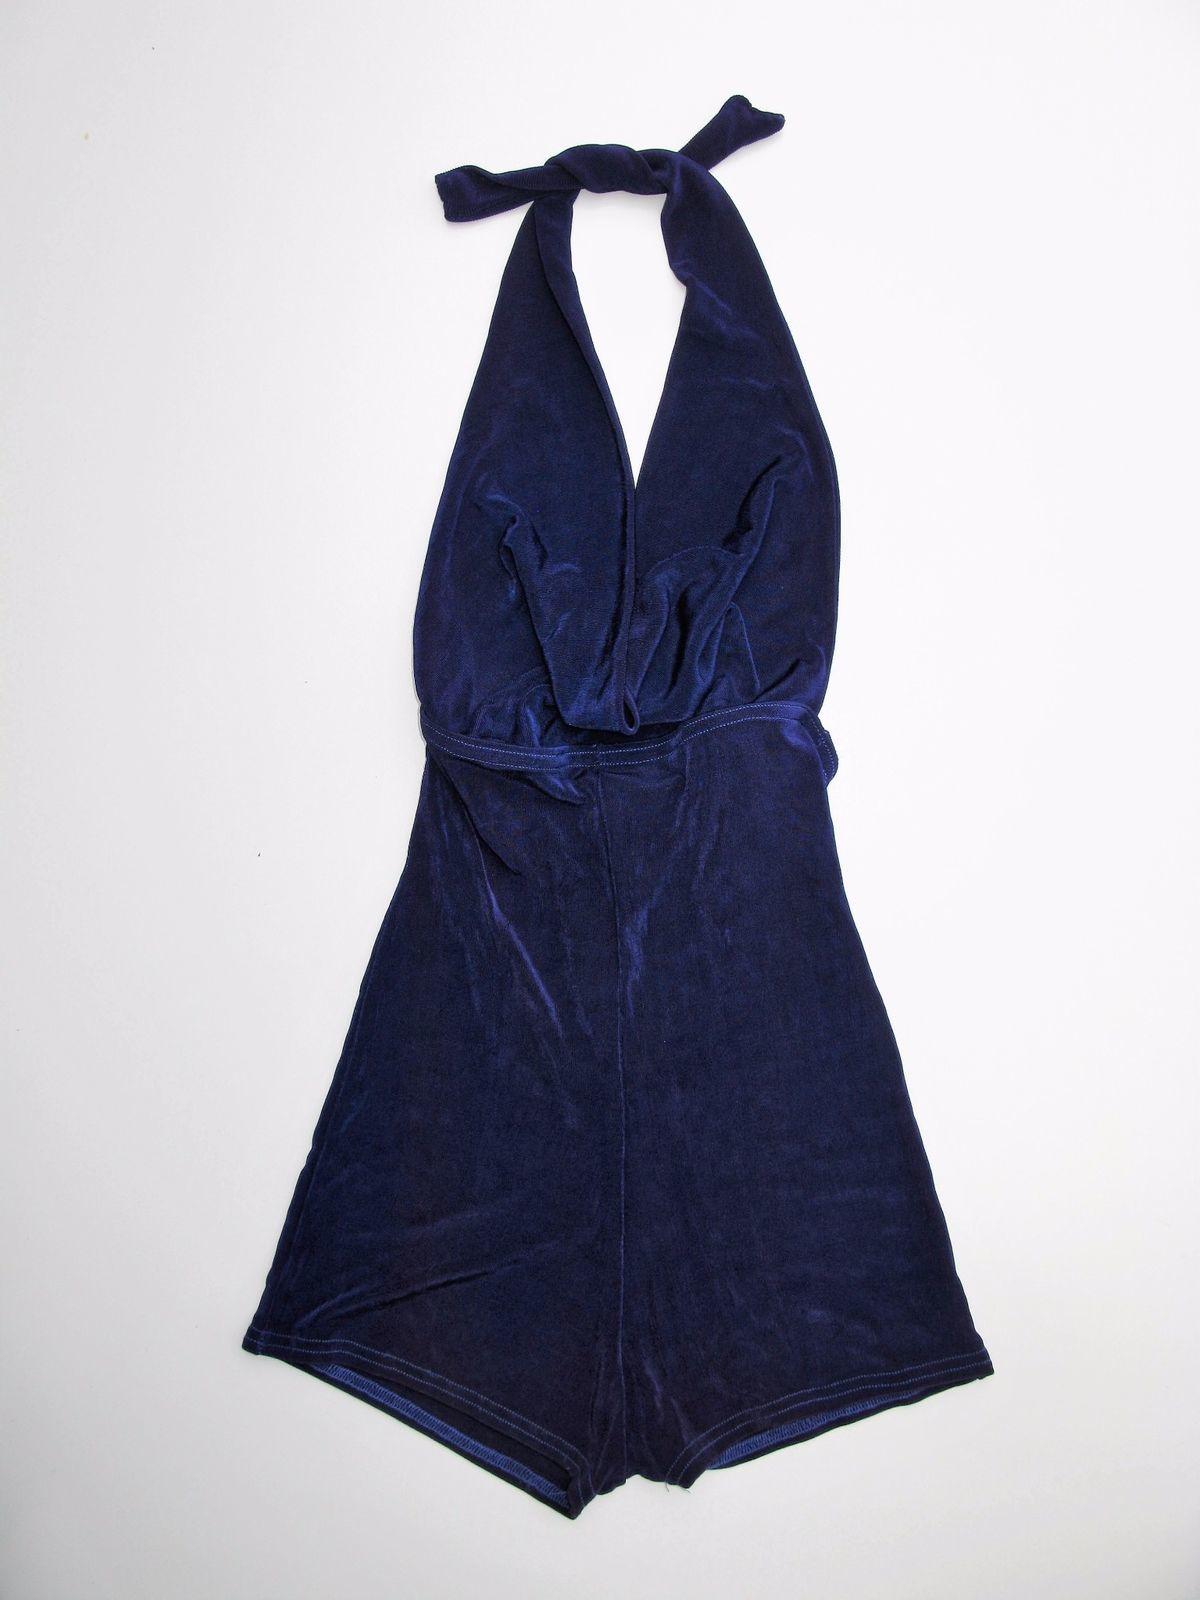 Romper Forplay Purple Slinky Jersey Draped BodyCon Halter NEW S/M NWT $49